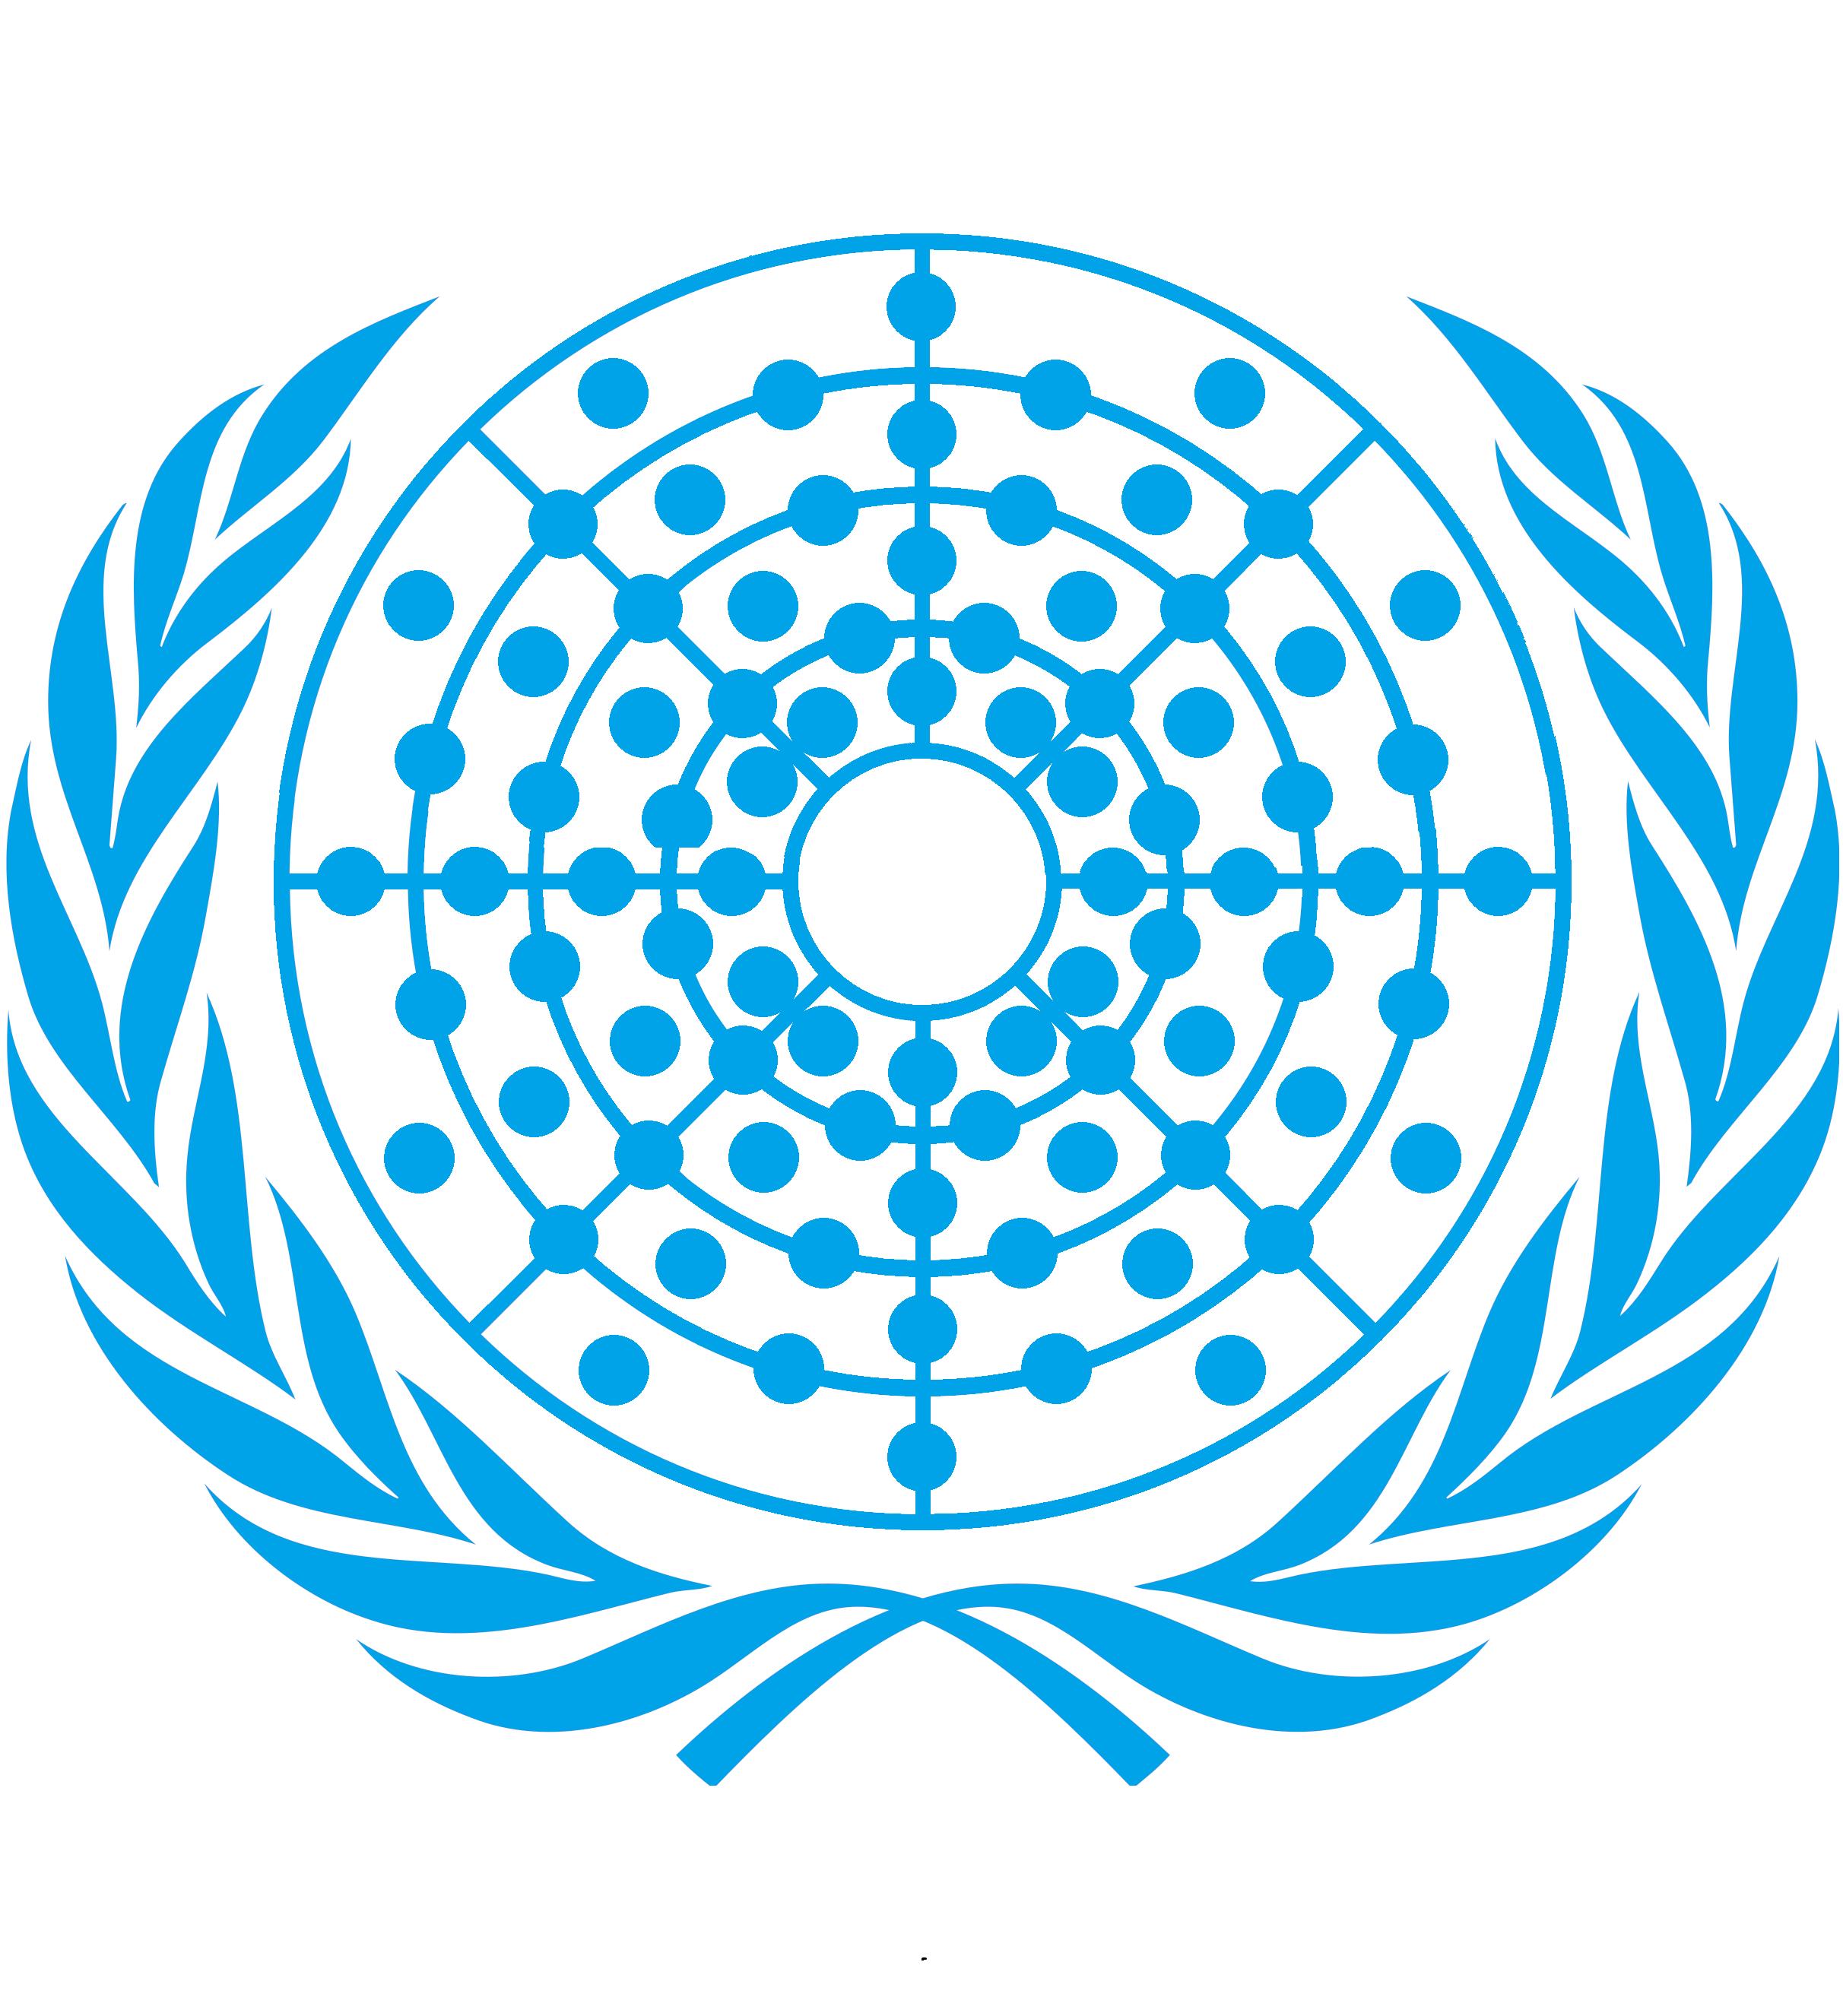 London Met Model United Nations Society